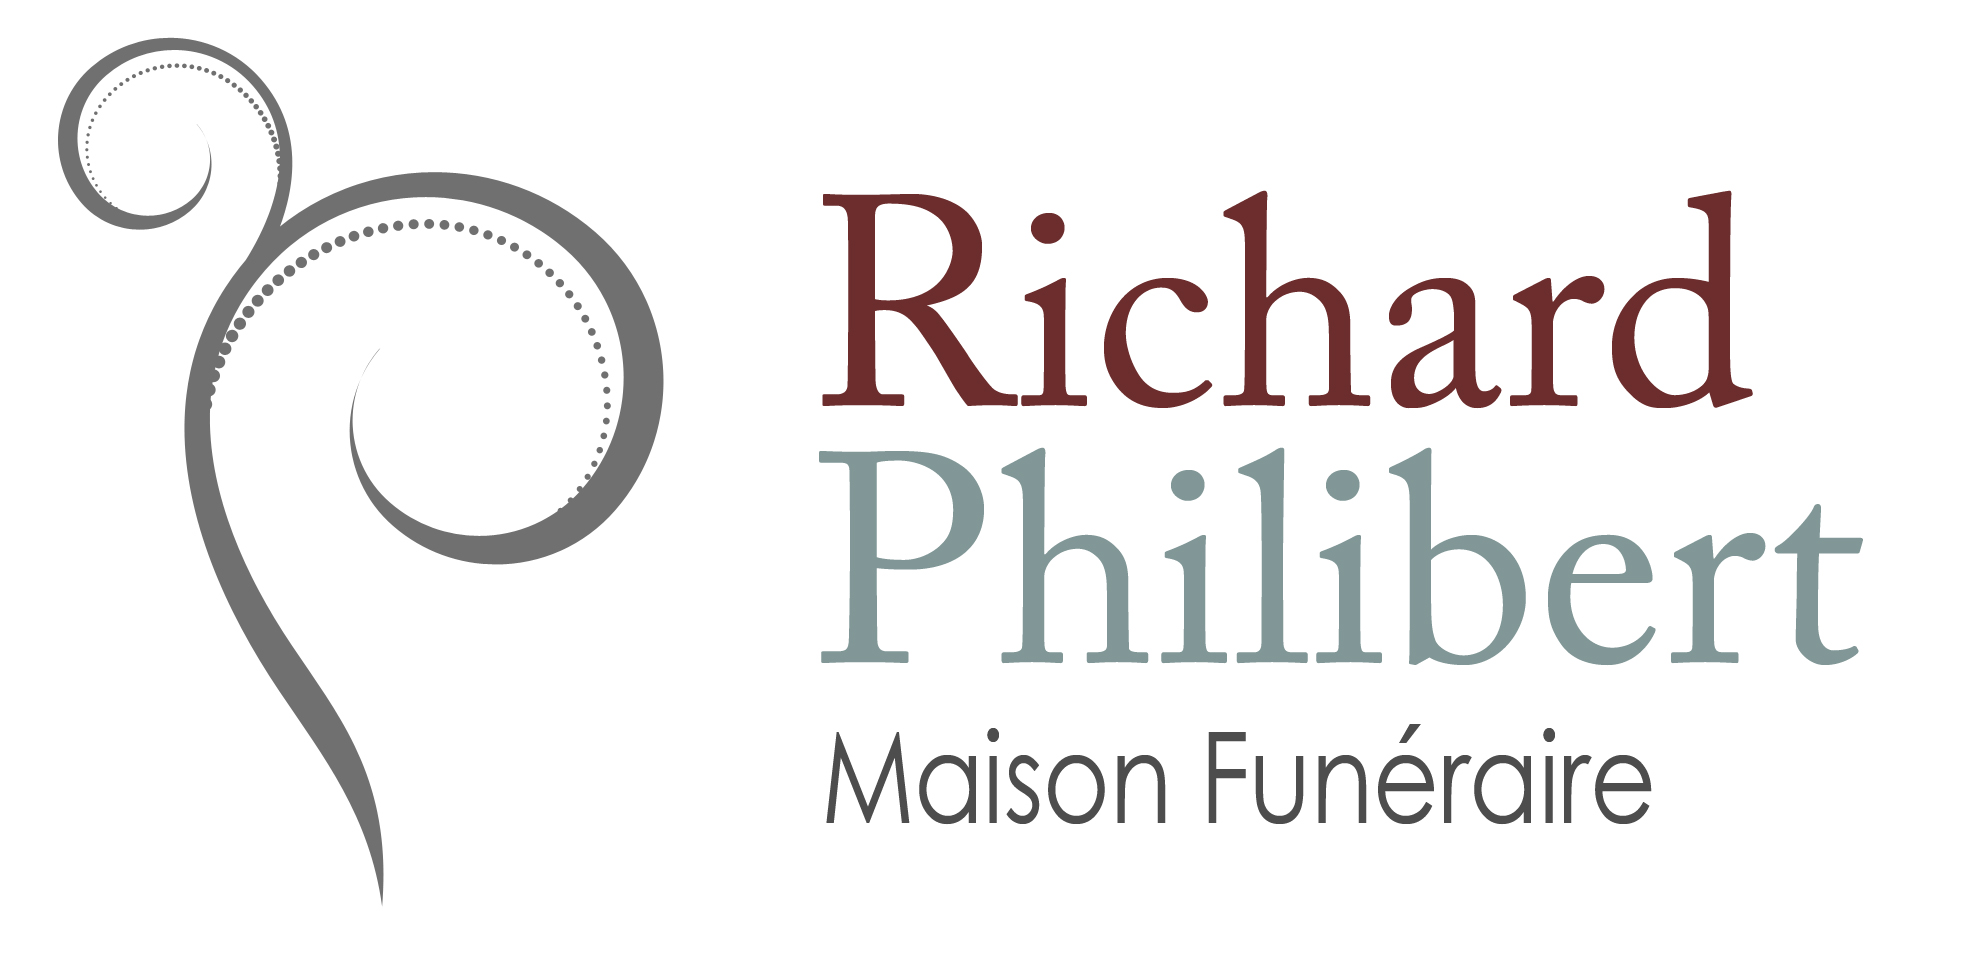 Richard & Philibert Maison Funéraire